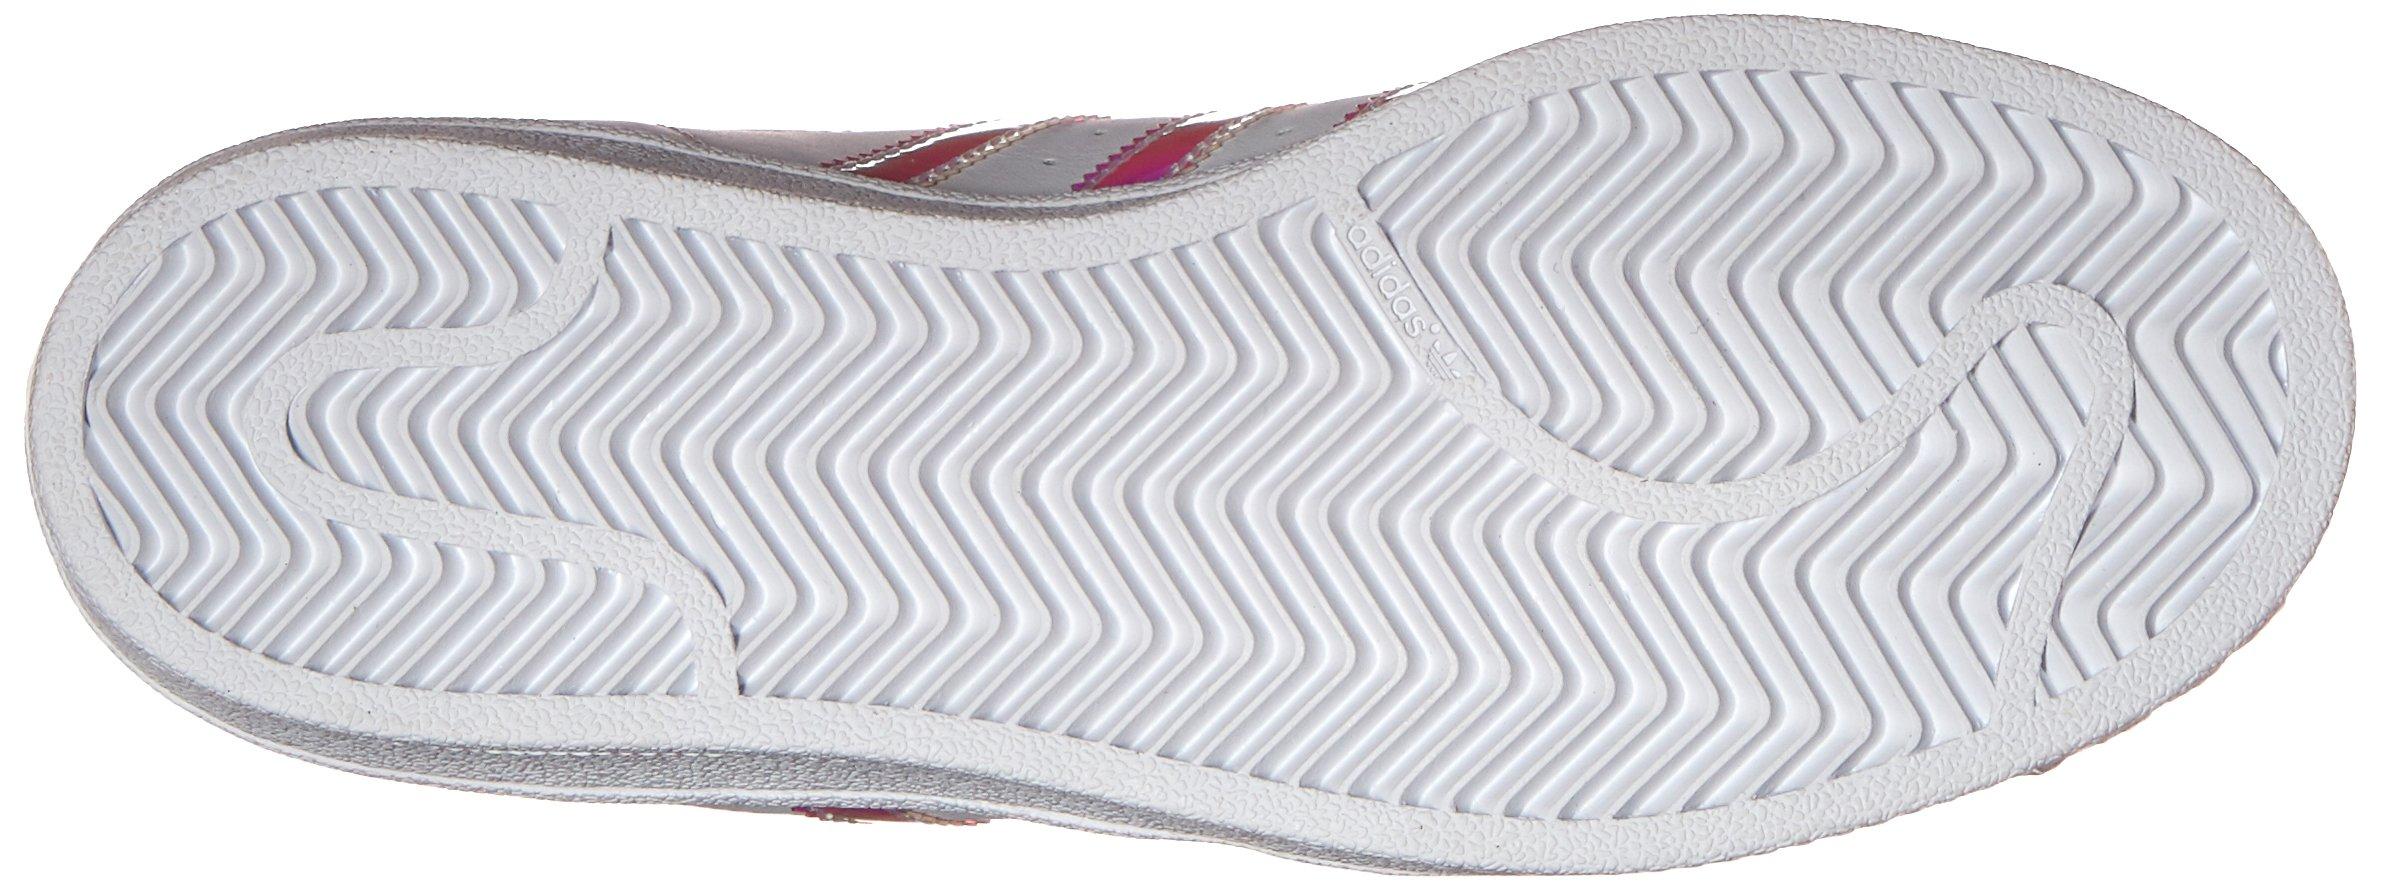 adidas Originals Kid's Superstar J Shoe, White/White/Metallic Silver, 4 M US Big Kid by adidas Originals (Image #3)